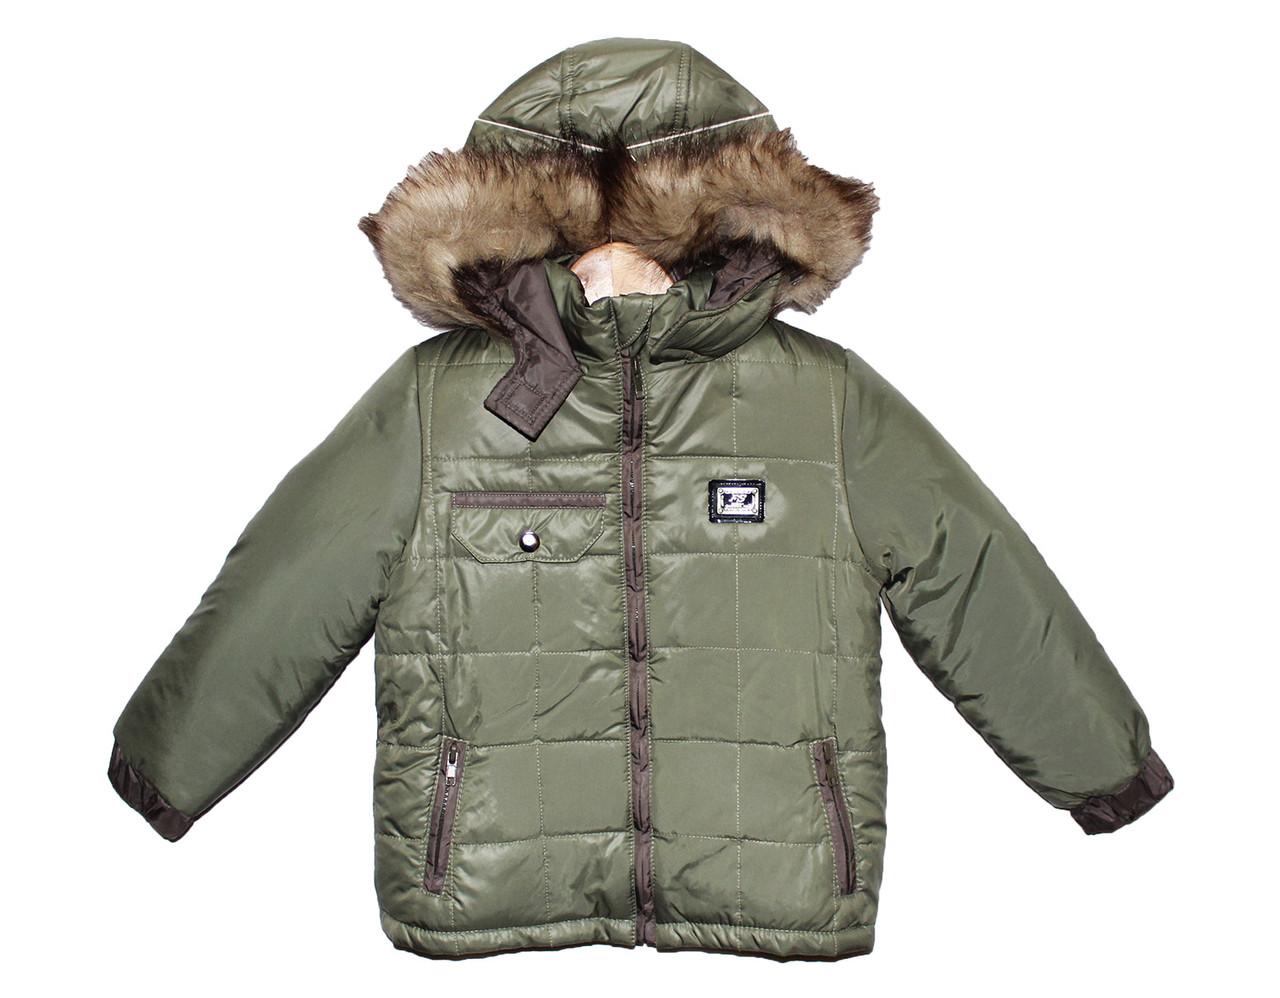 Курточки зимние для мальчика на зиму Щасливчік